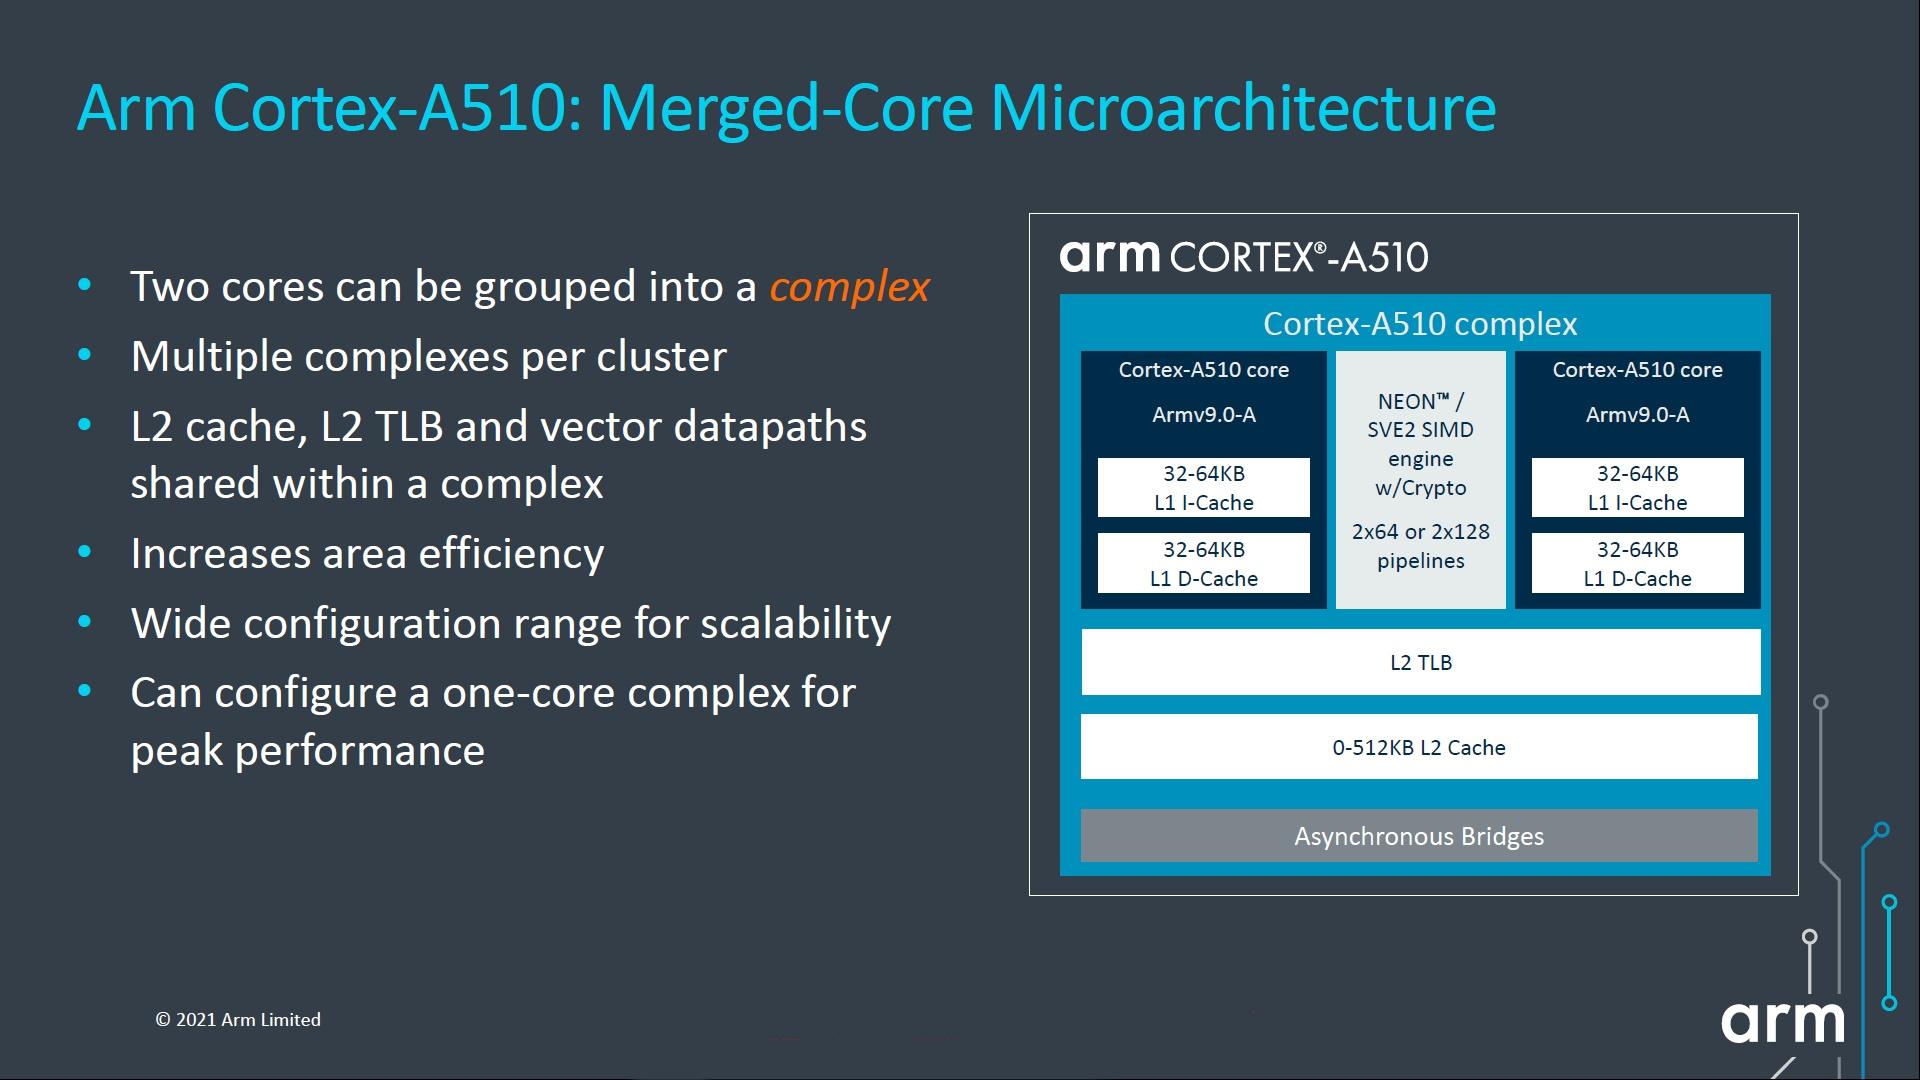 Cortex A510 merged core microarchitecture